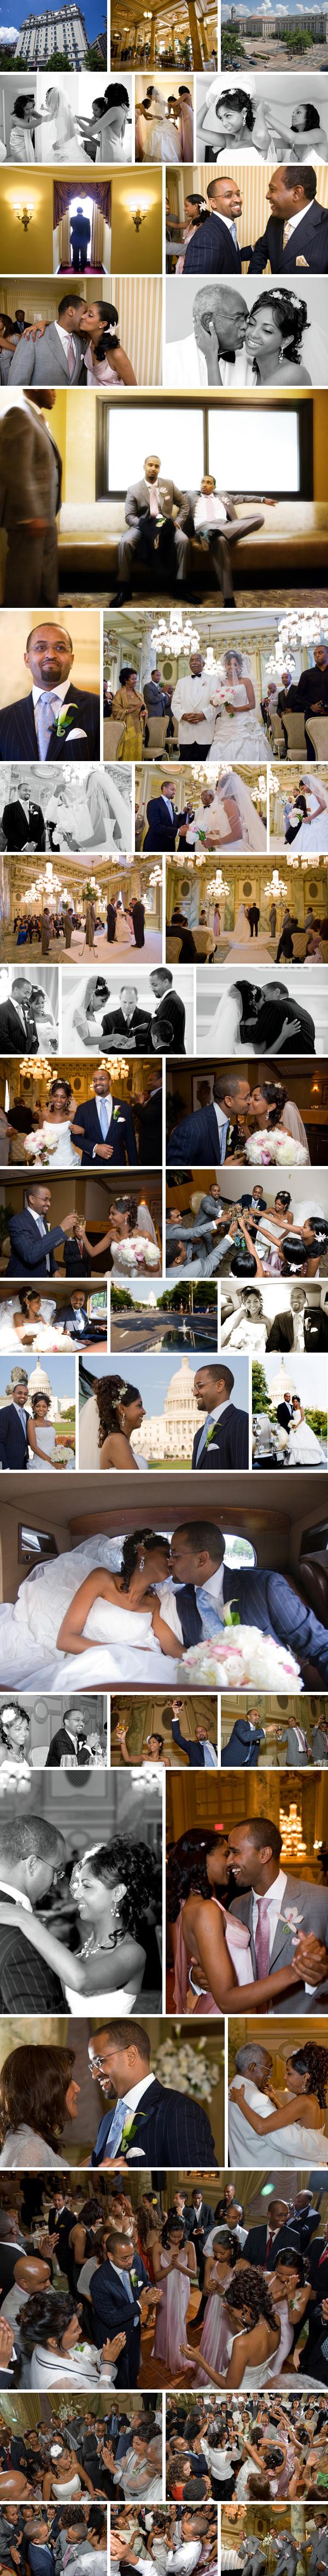 willard hotel washington dc weddings